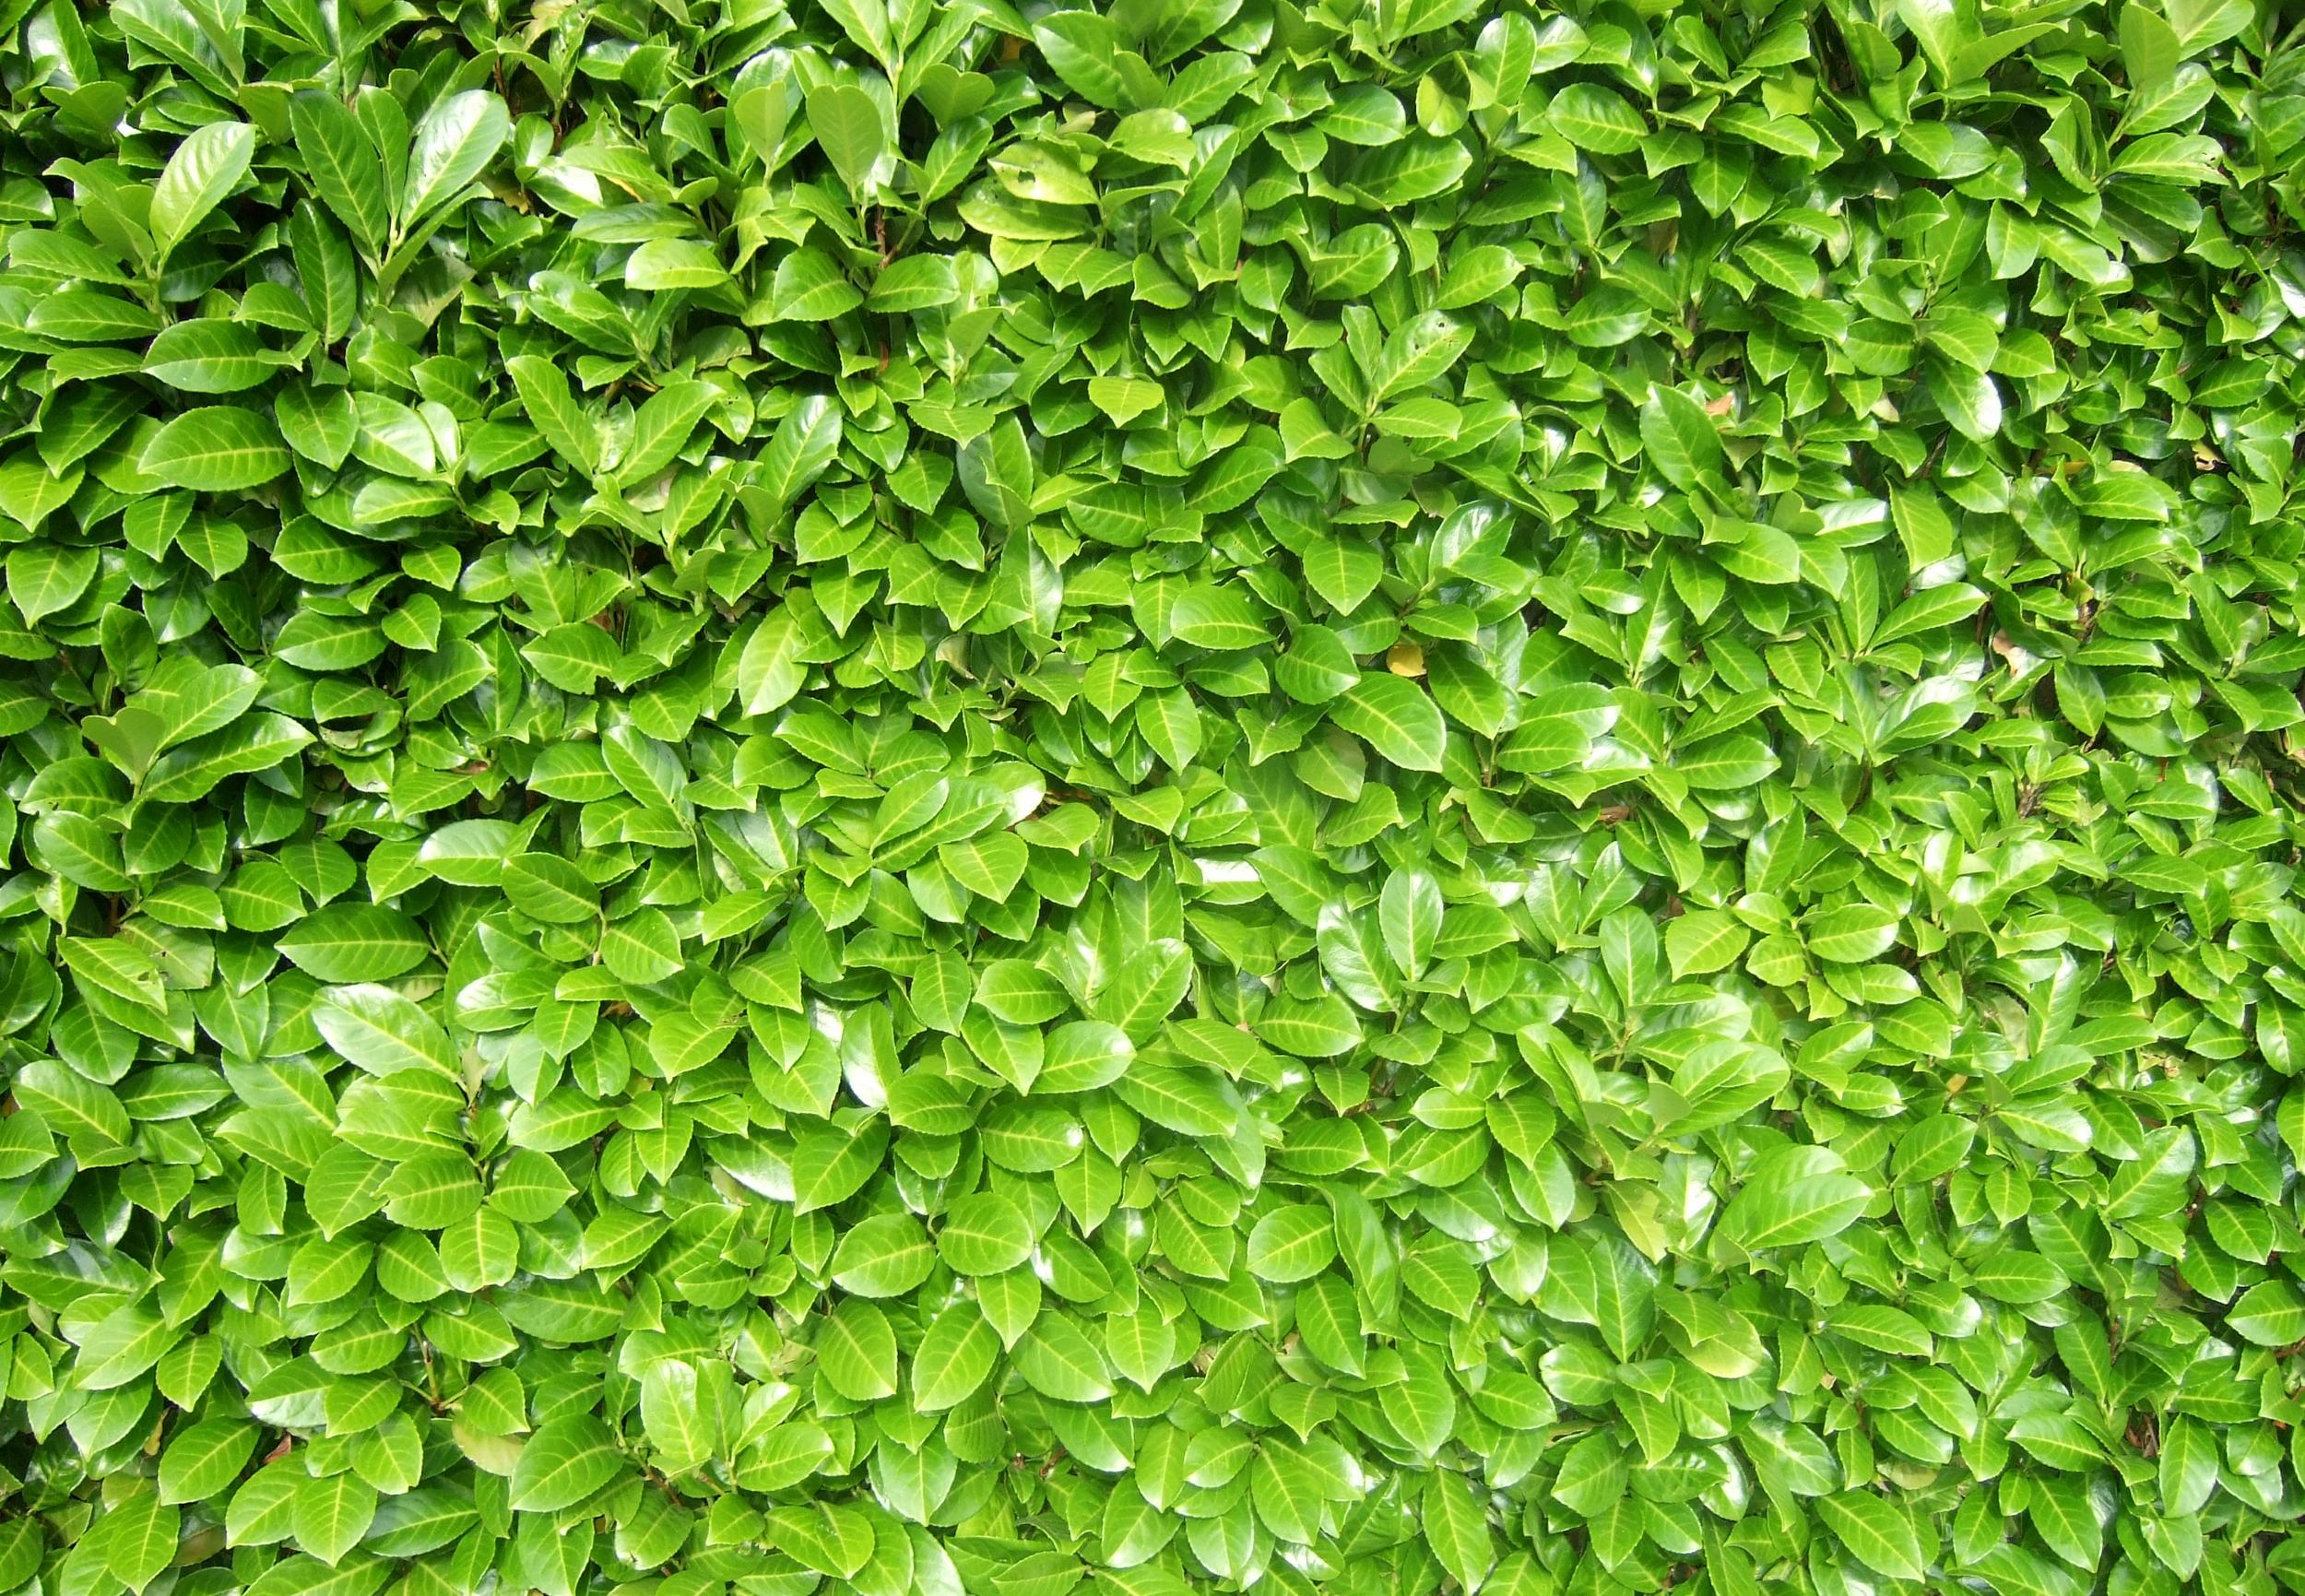 Green Hedge Image